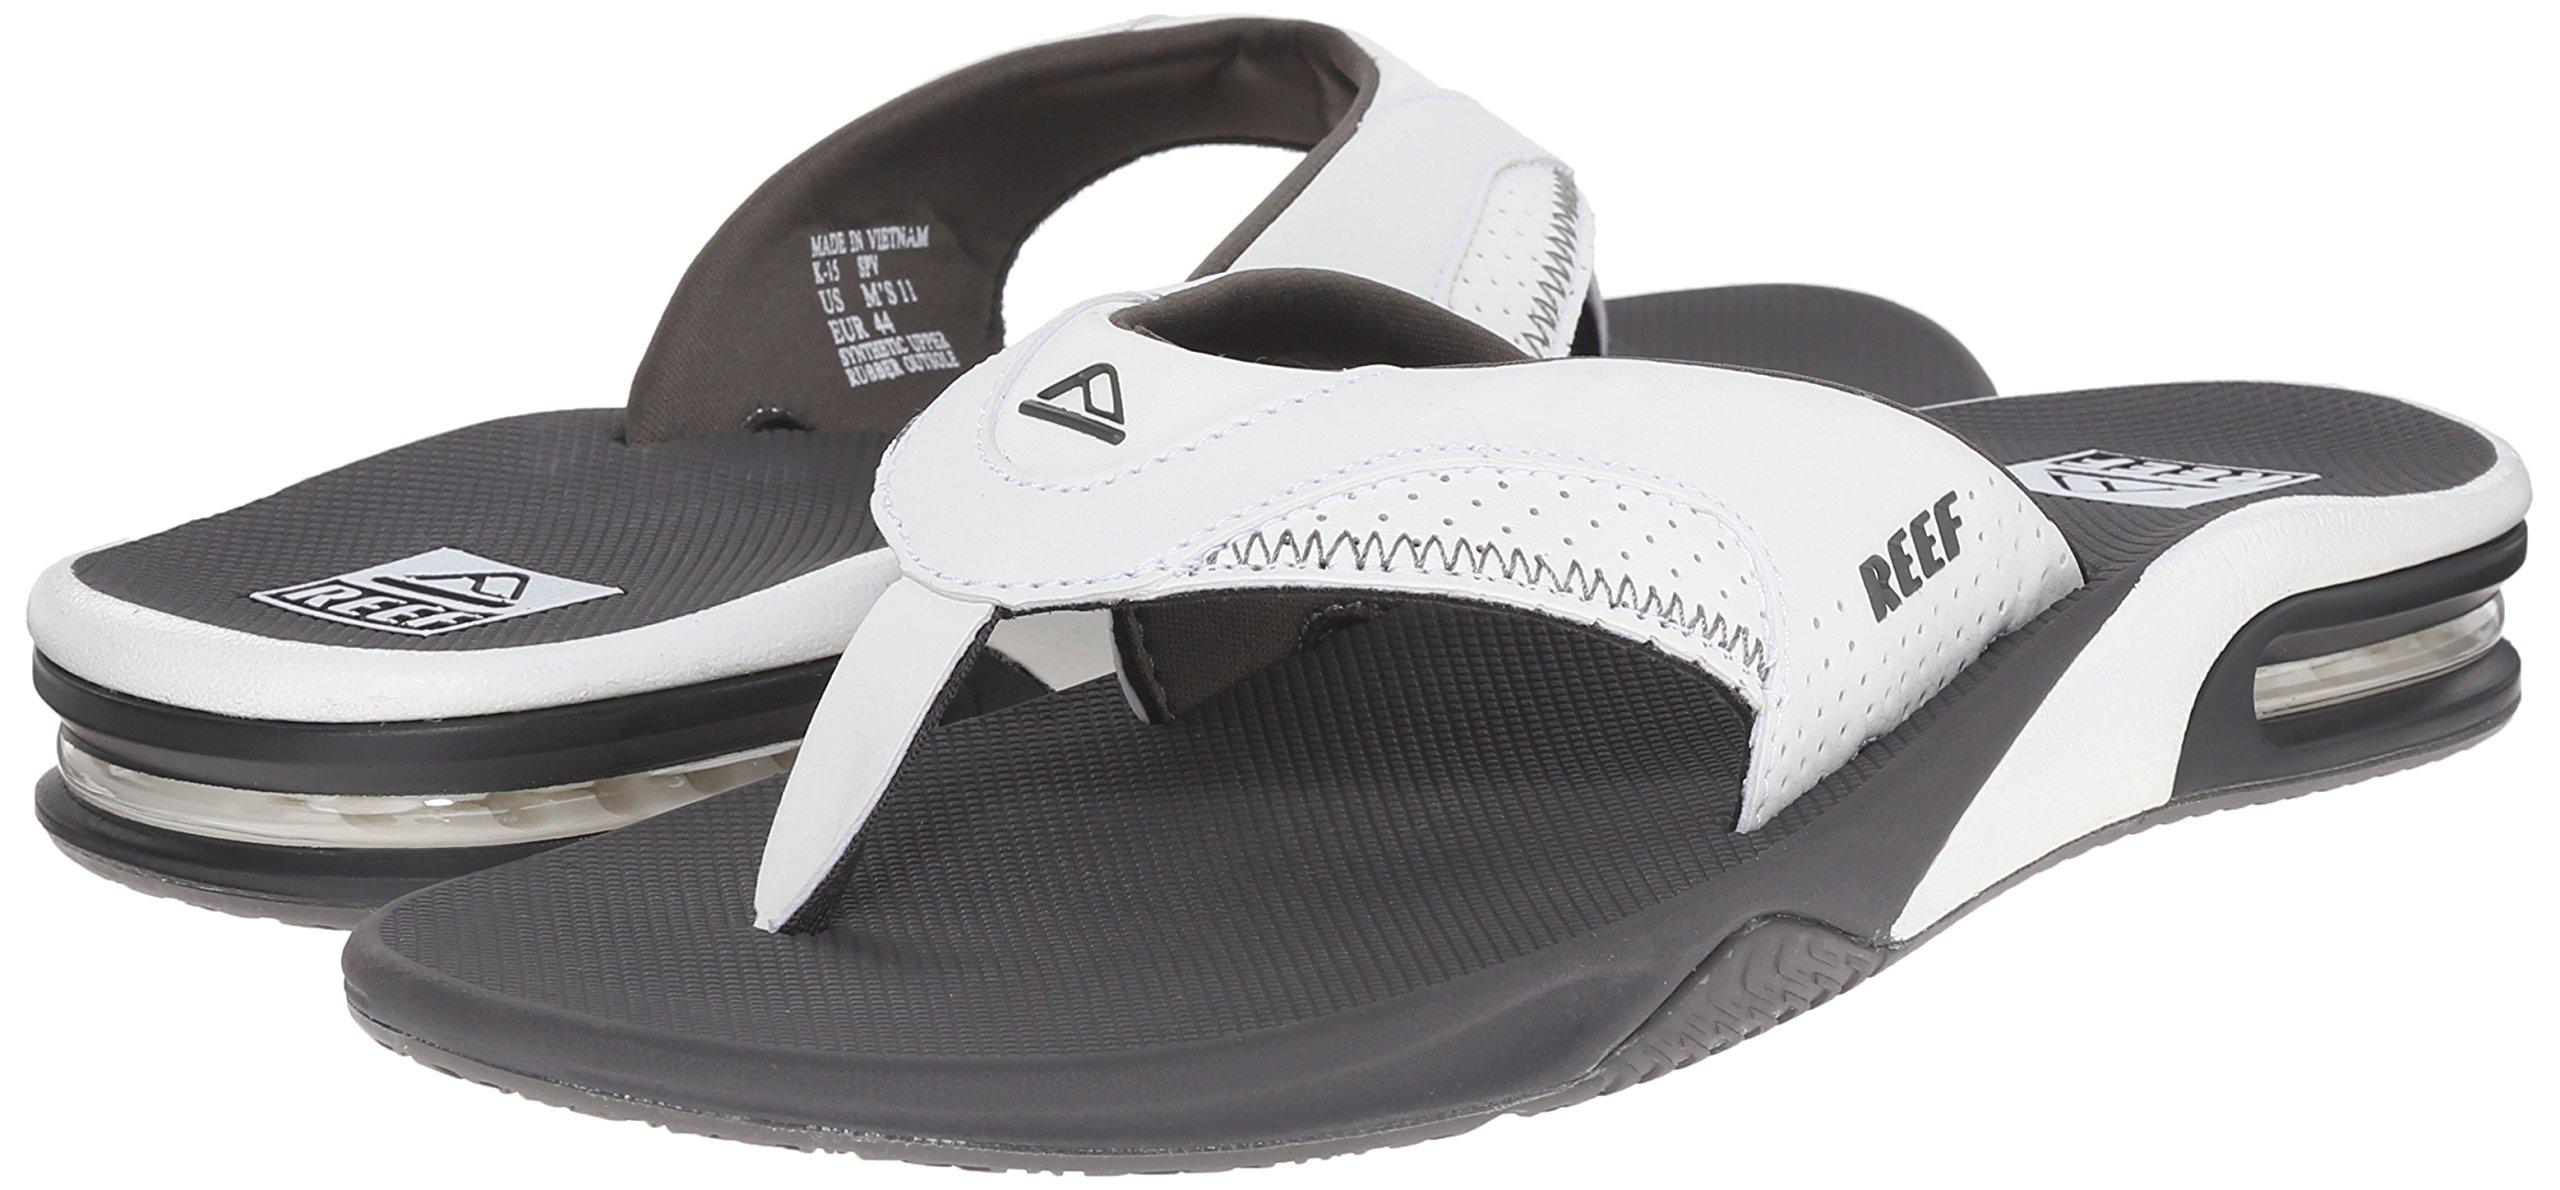 Reef Fanning Mens Sandals  Bottle Opener Flip Flops For Men,GREY/WHITE,7 M US by Reef (Image #6)